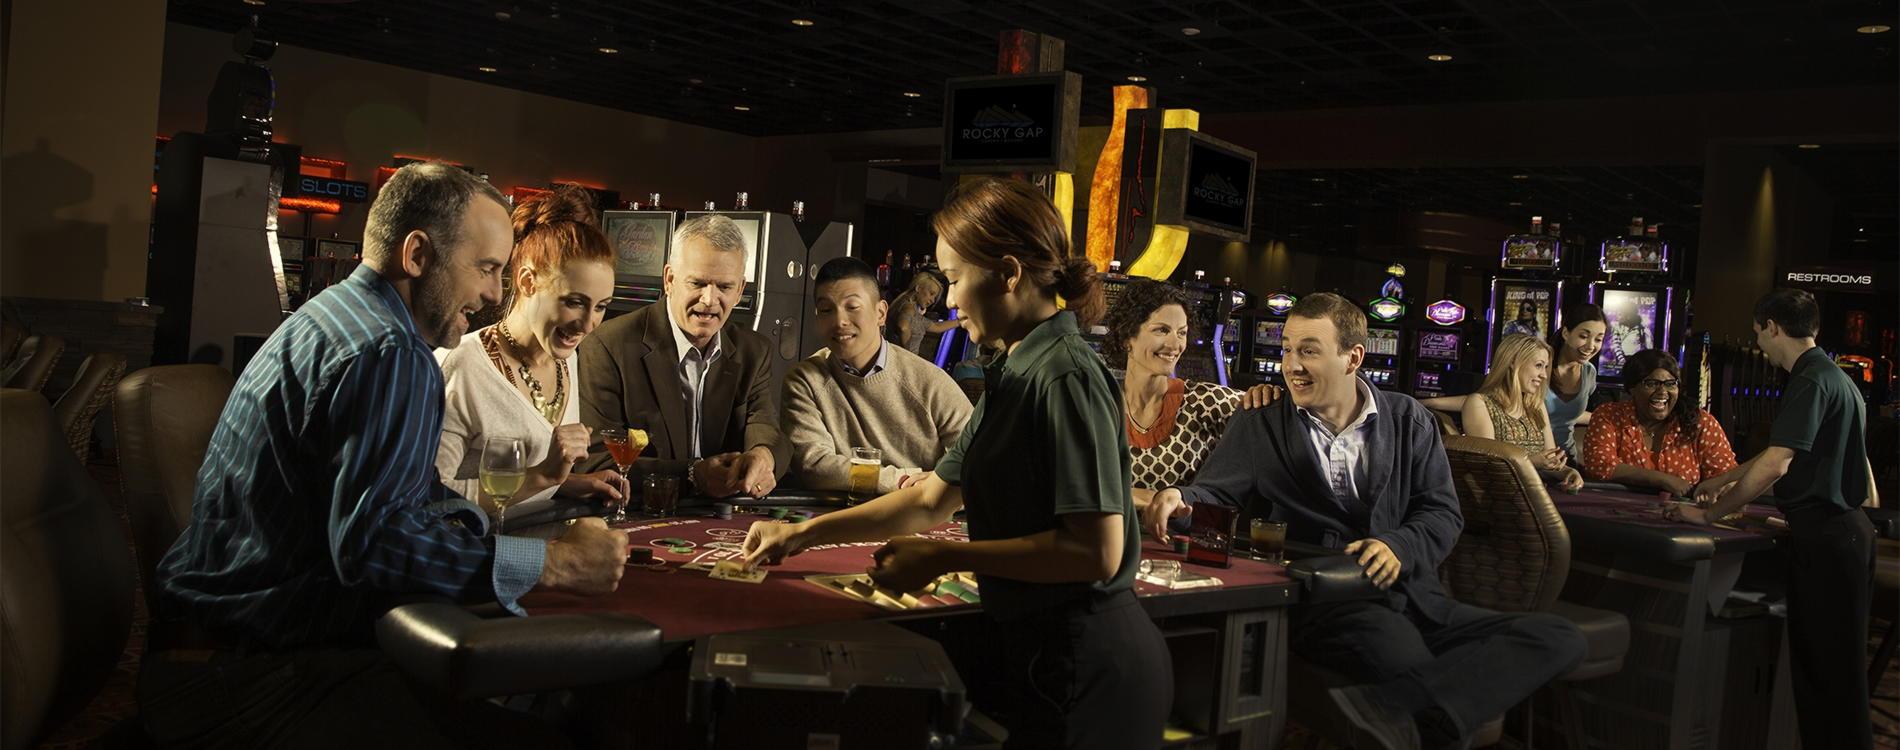 Tiket Kasino EURO 315 di Bingo Besties